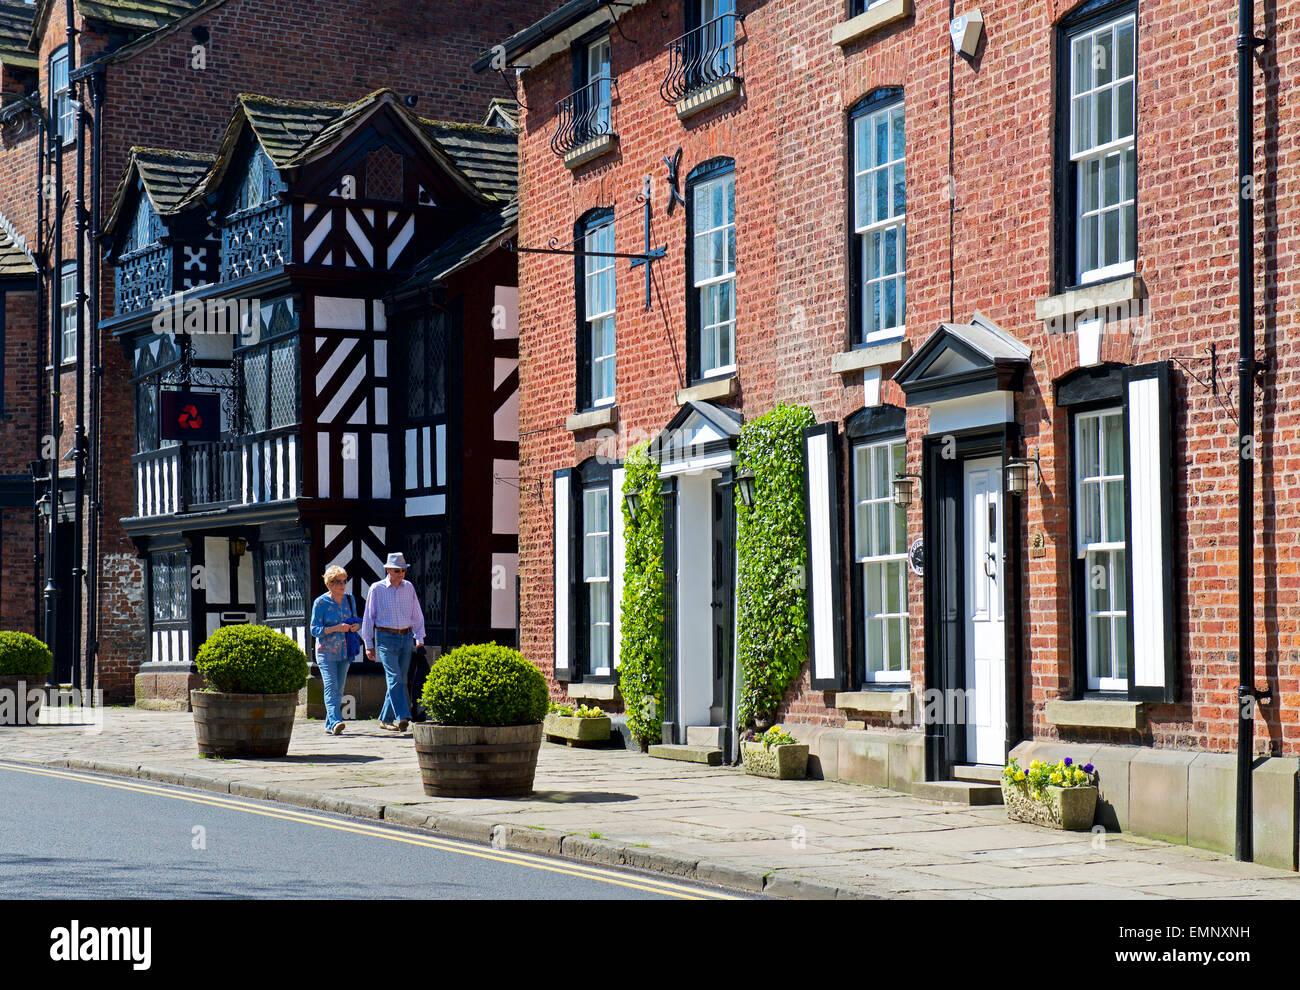 Couple walking down street in the village of Prestbury, Cheshire, England UK - Stock Image